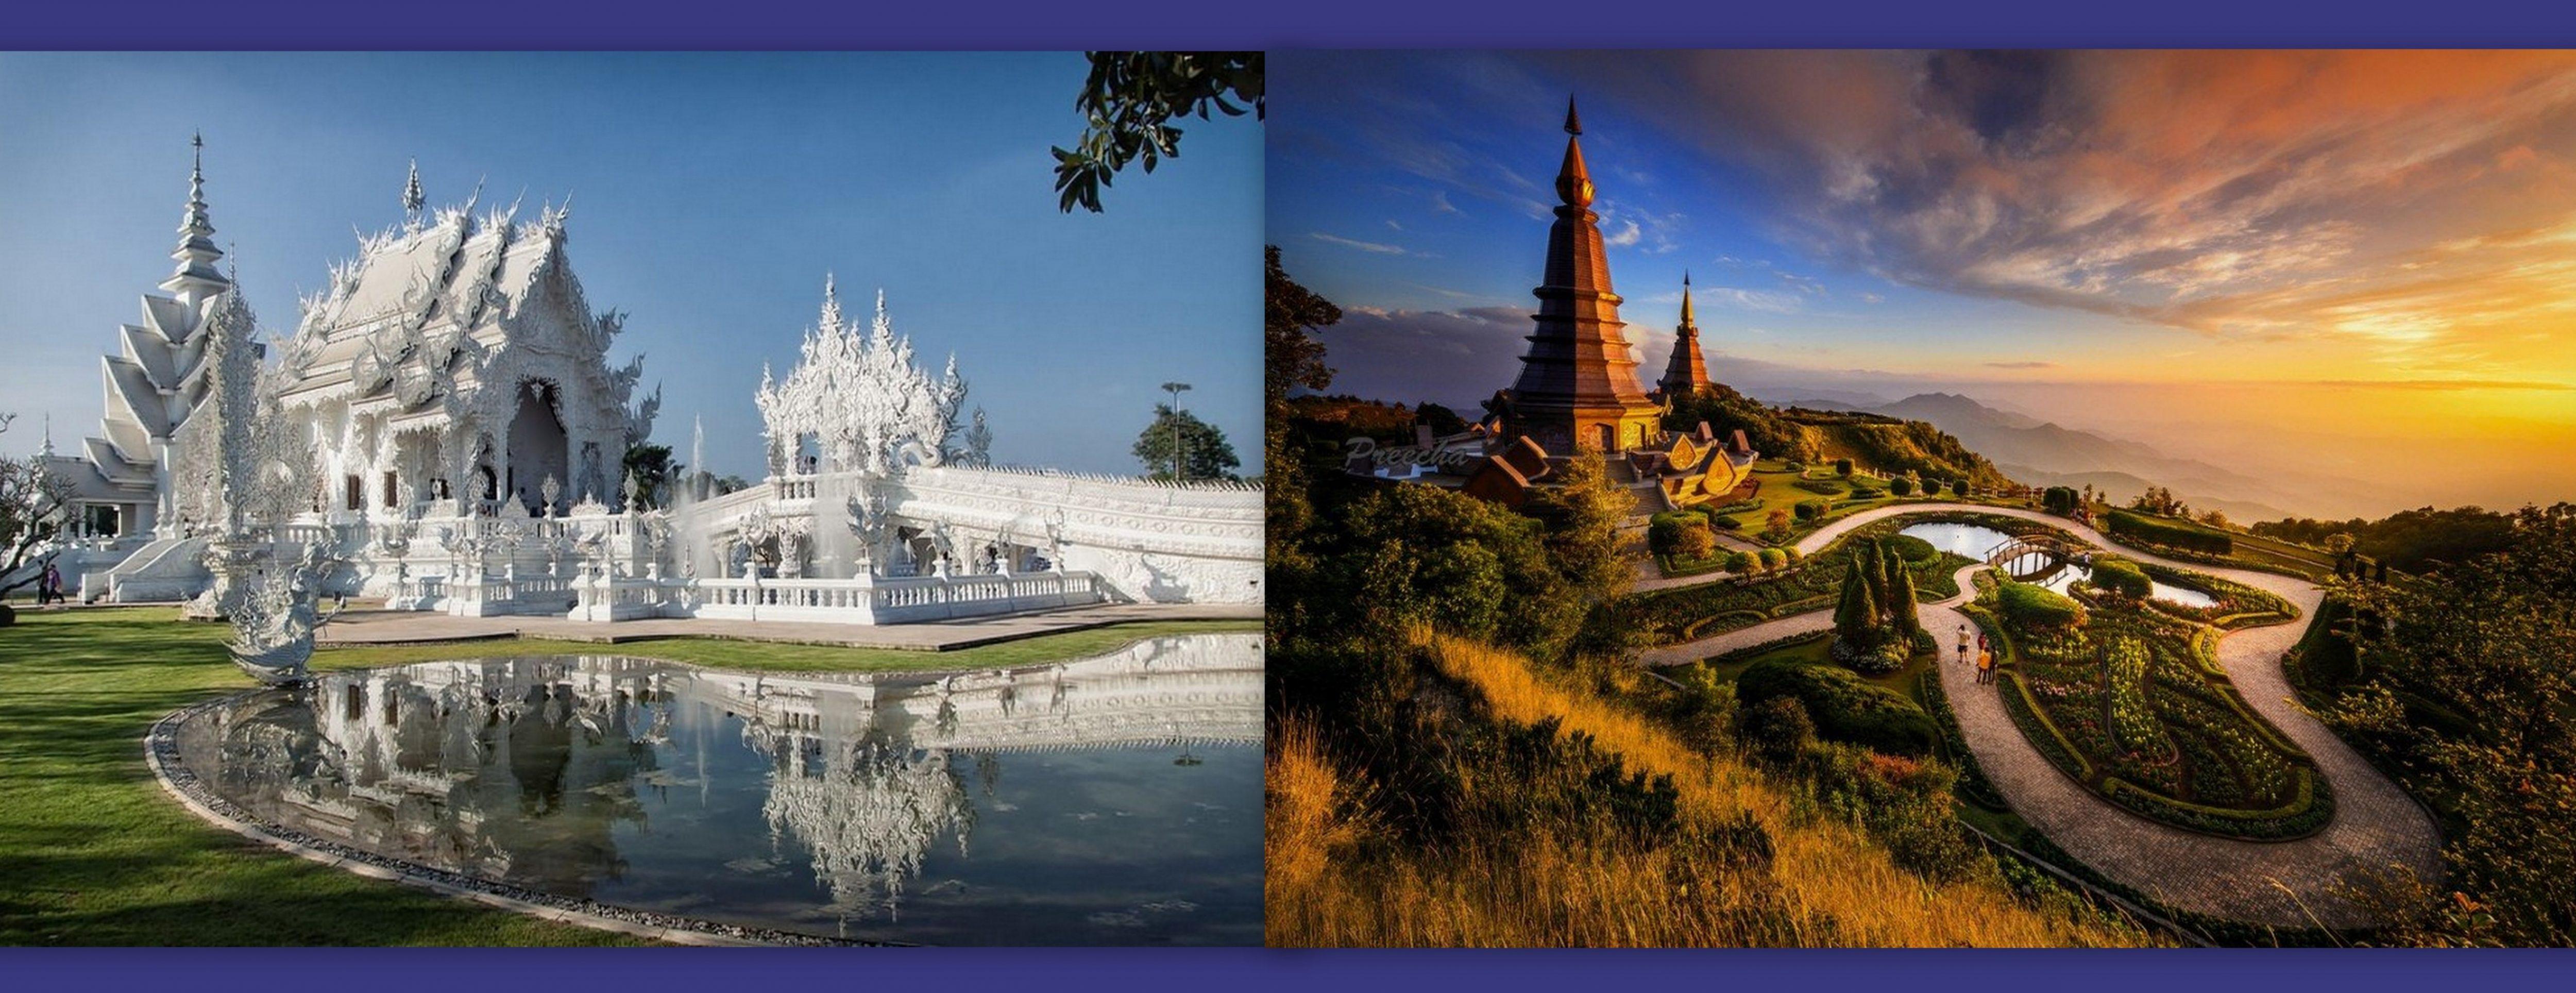 Путешествие по Северу Тайланда на мотоцикле (7 дней), Путешественник